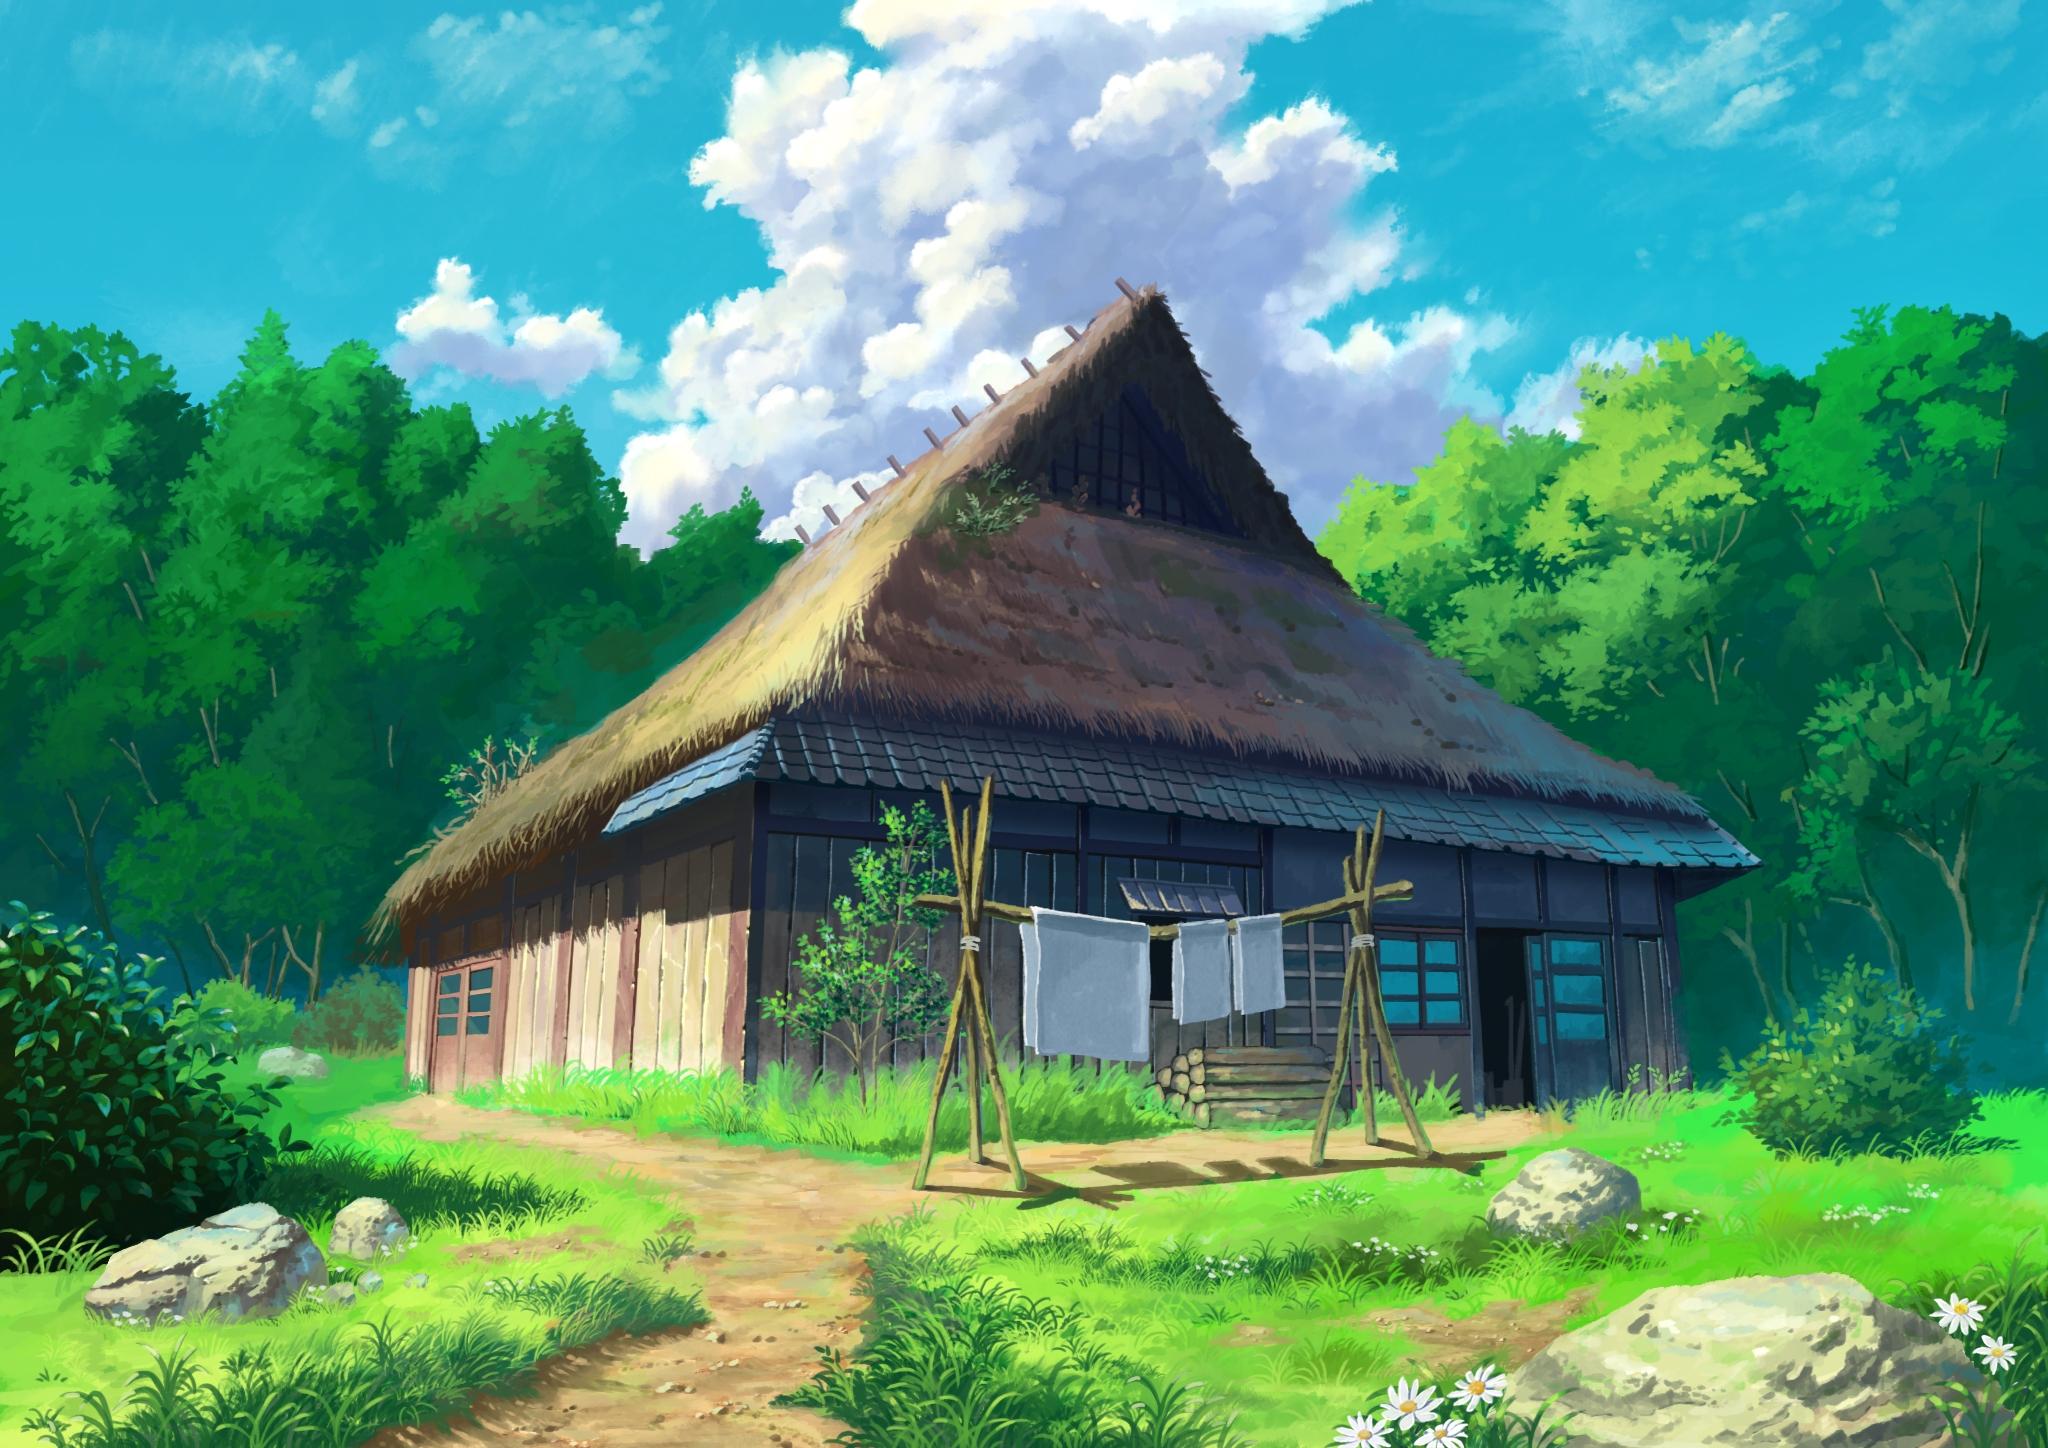 Neckeetova kuca Anime-house-forest-clouds-scenic